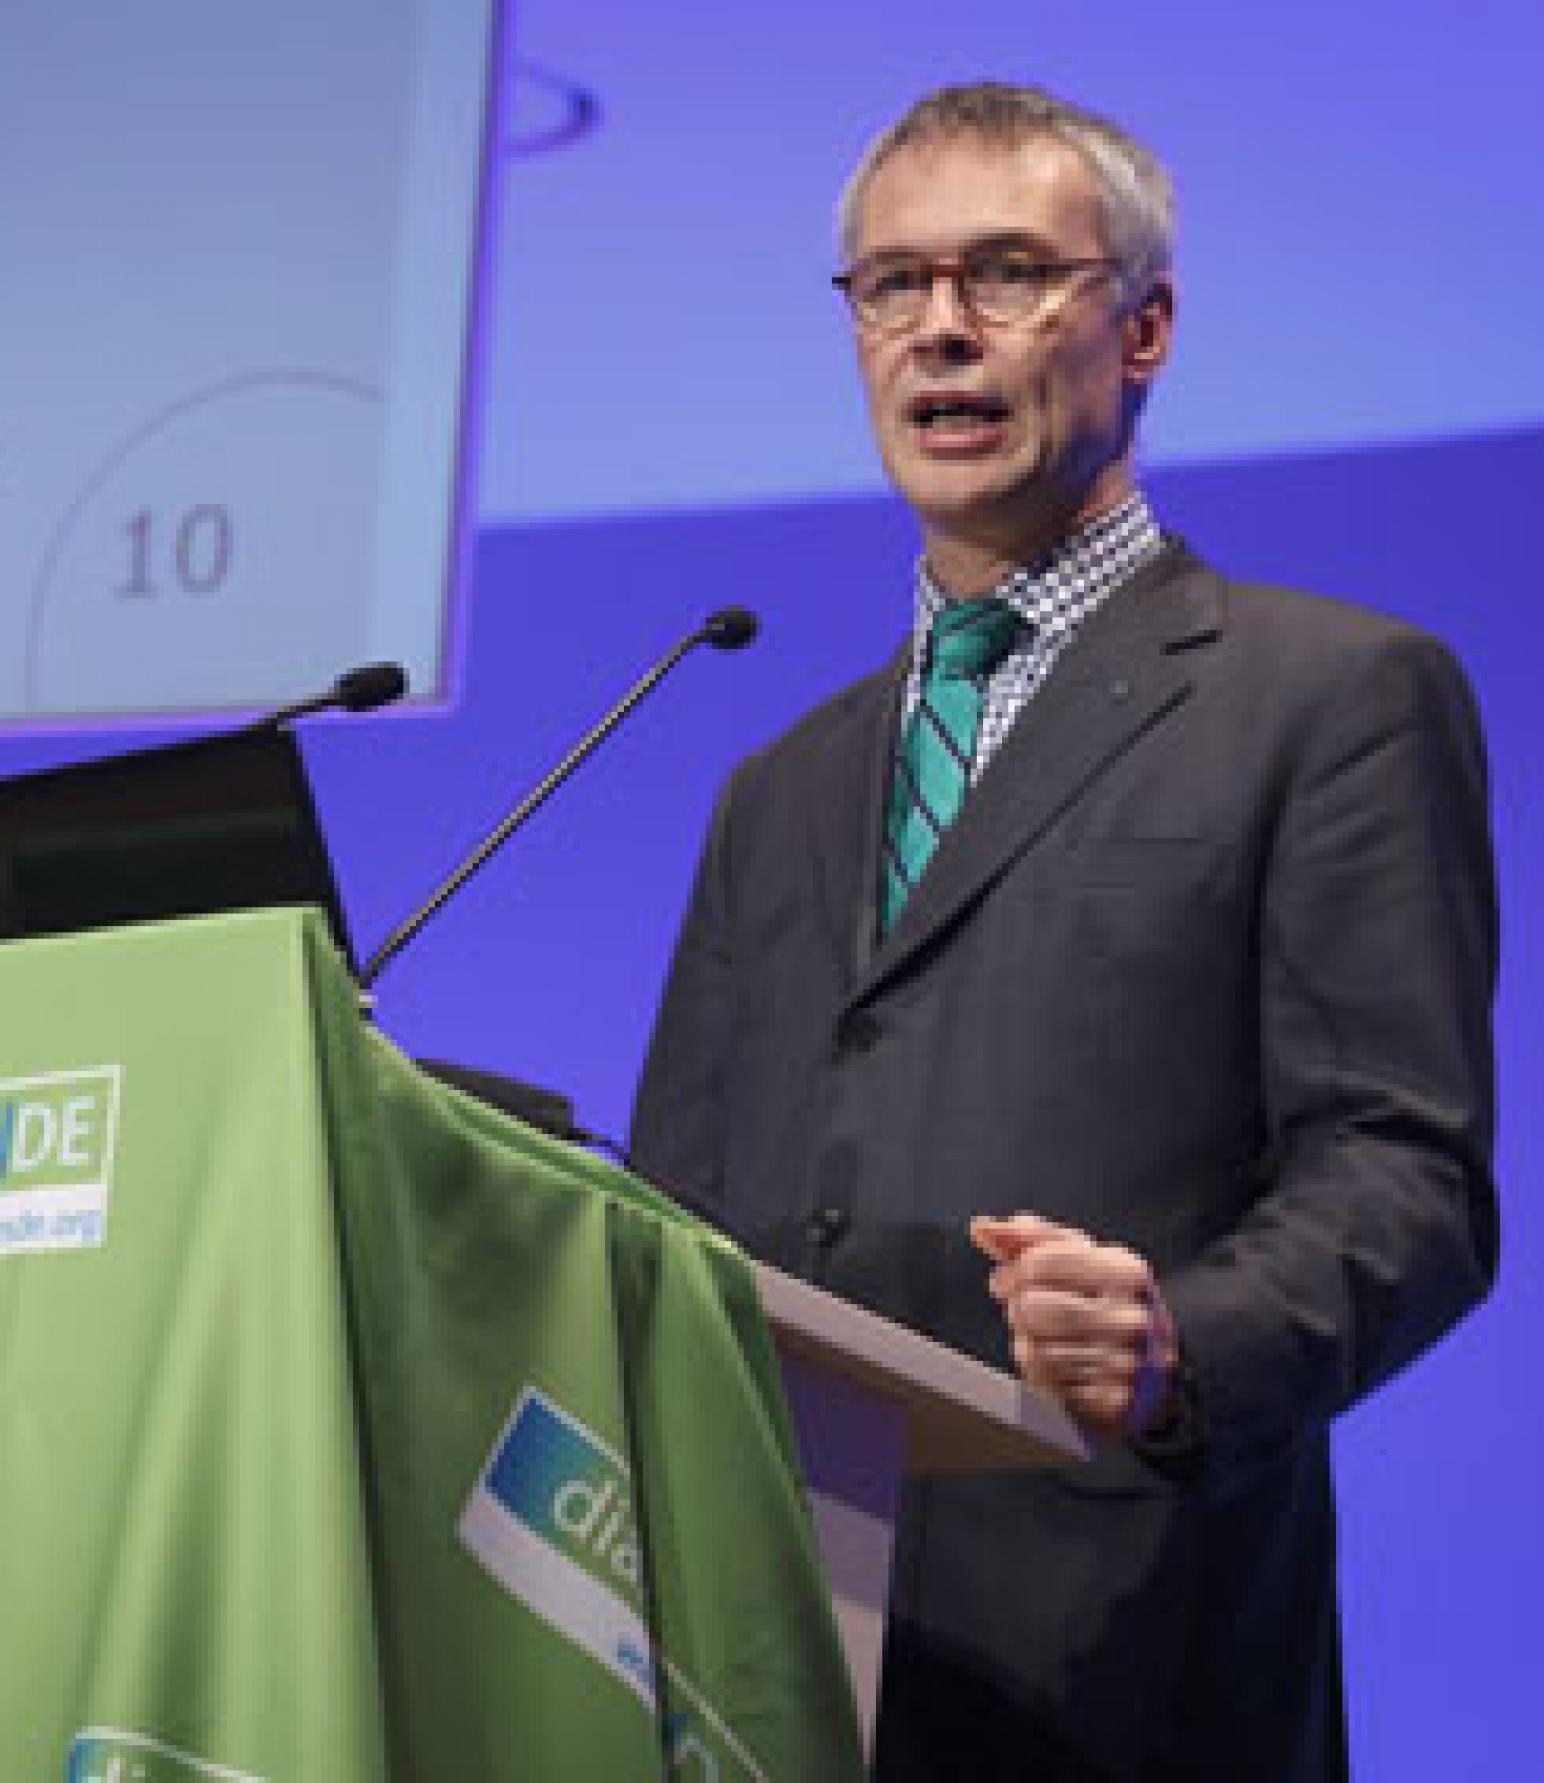 Weltdiabetes Tag 2010 - Prof. Dr. Thomas Danne